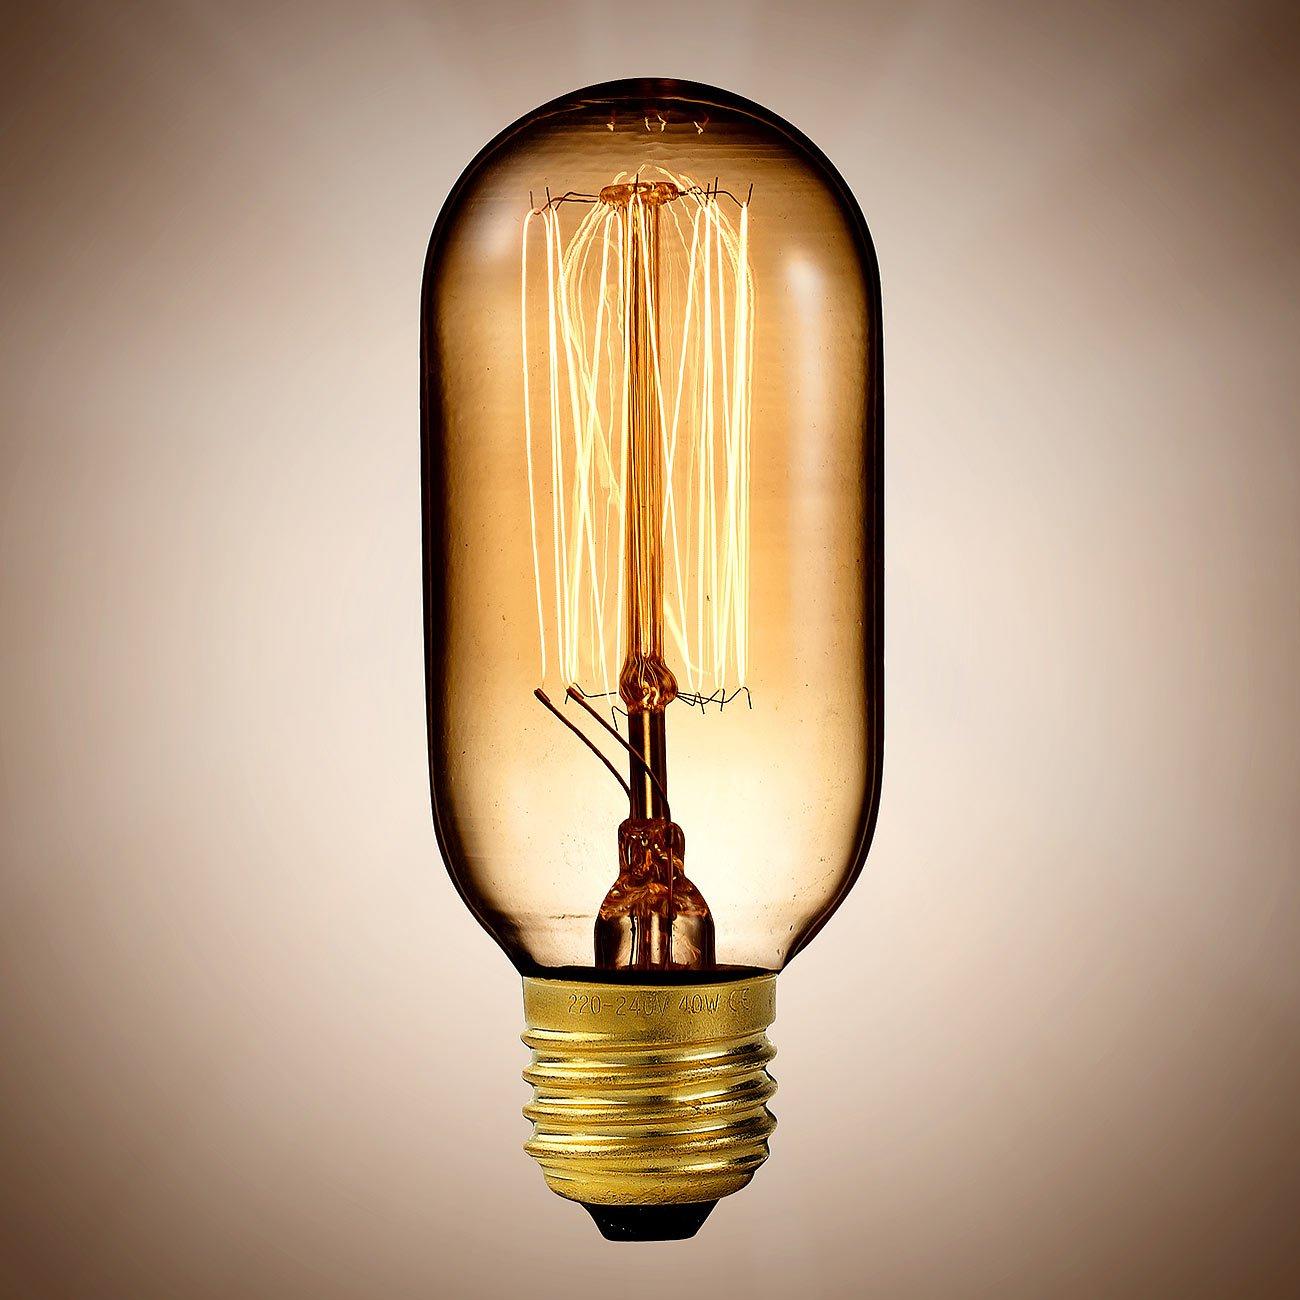 Luminea Glühbirne Draht sichtbar: Vintage-Schmucklampe, Tubular ...